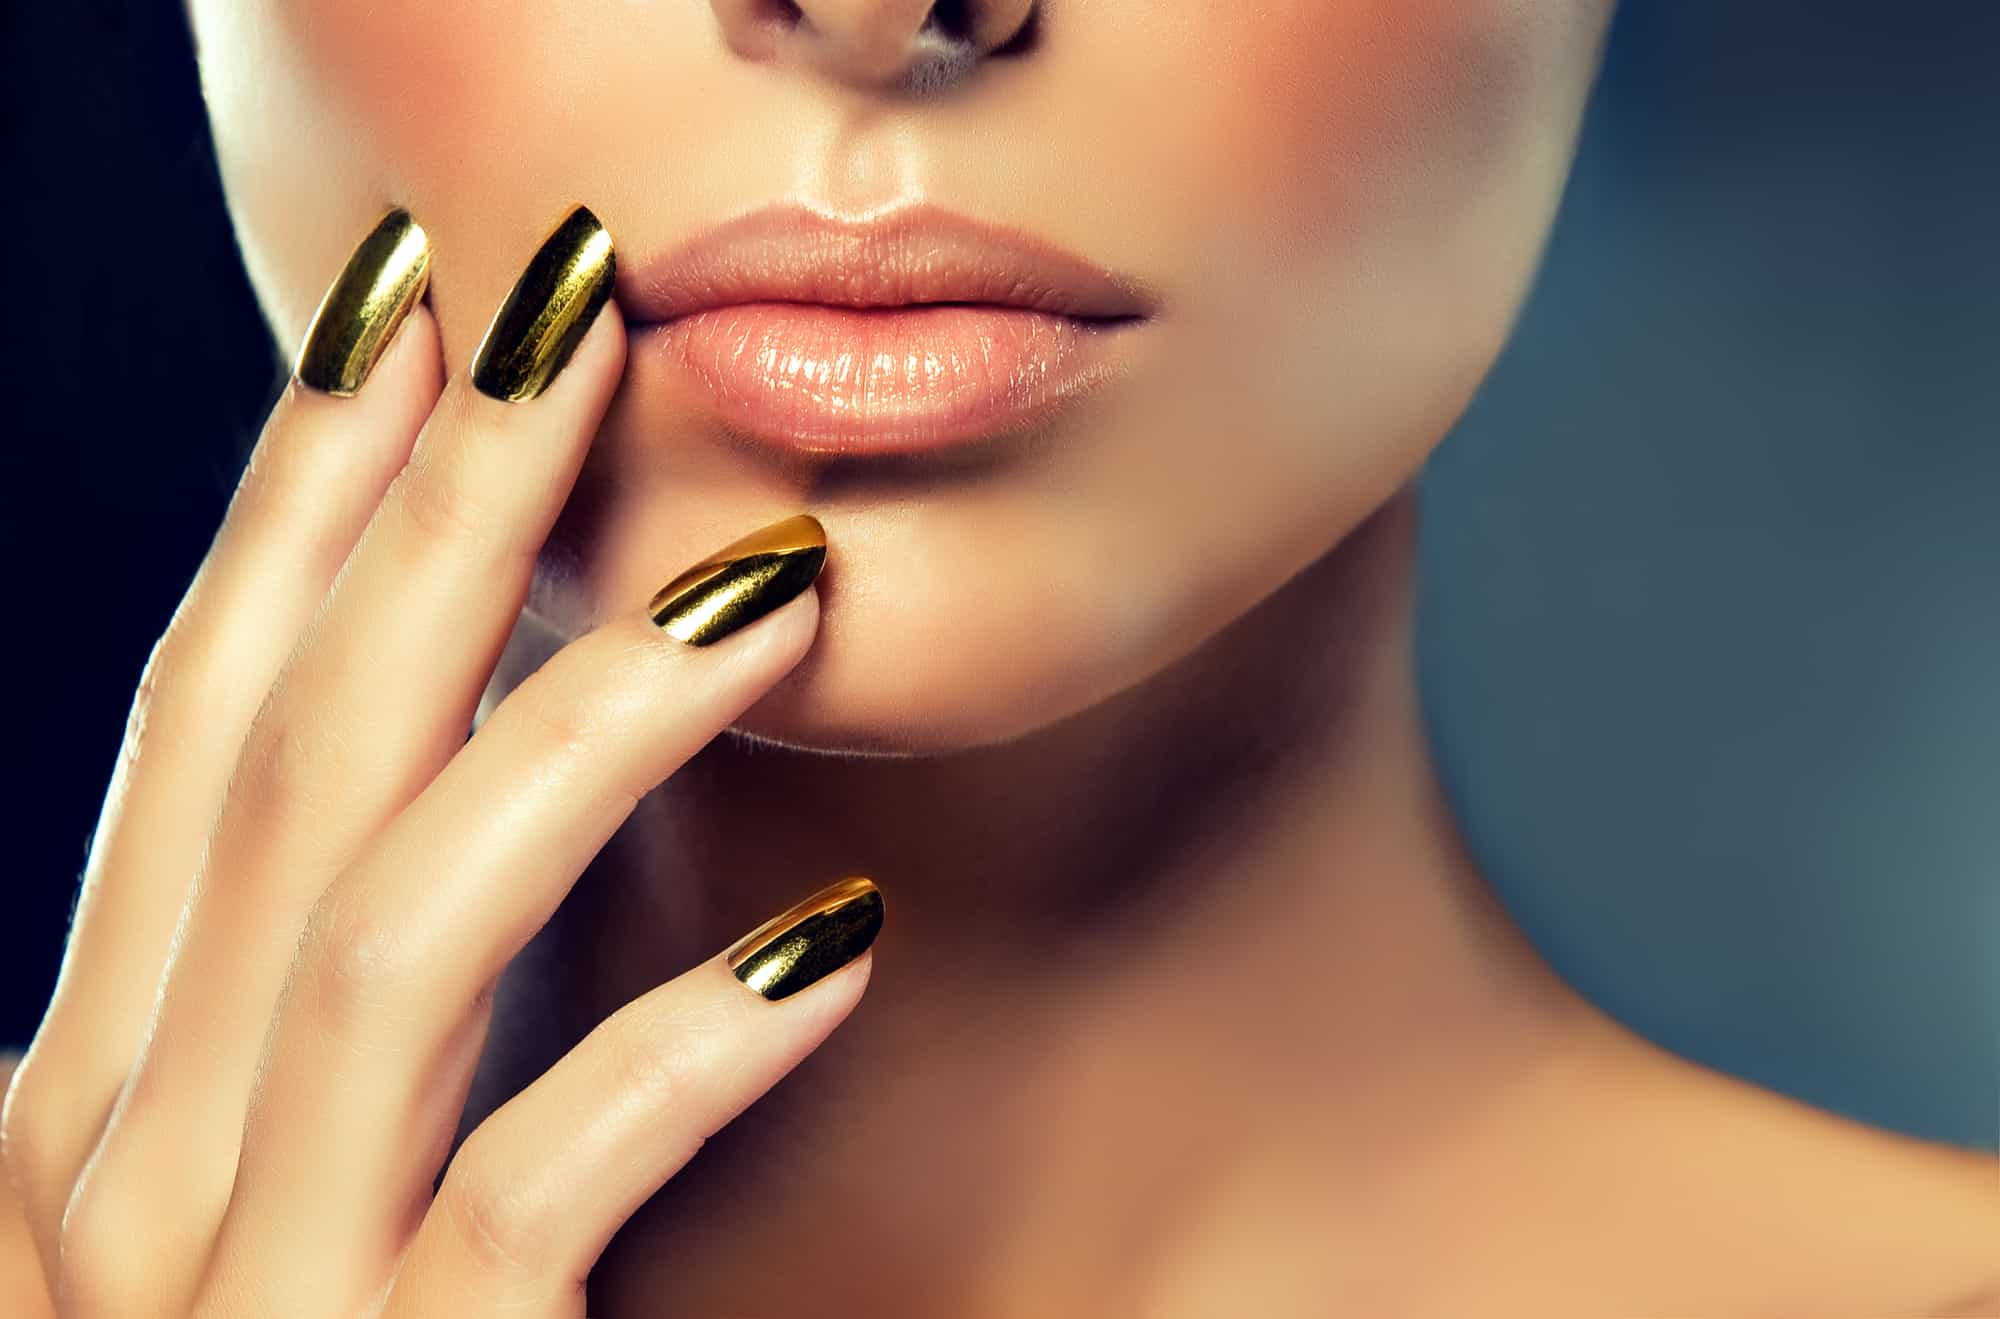 beautiful woman wearing gold non-toxic nail polish